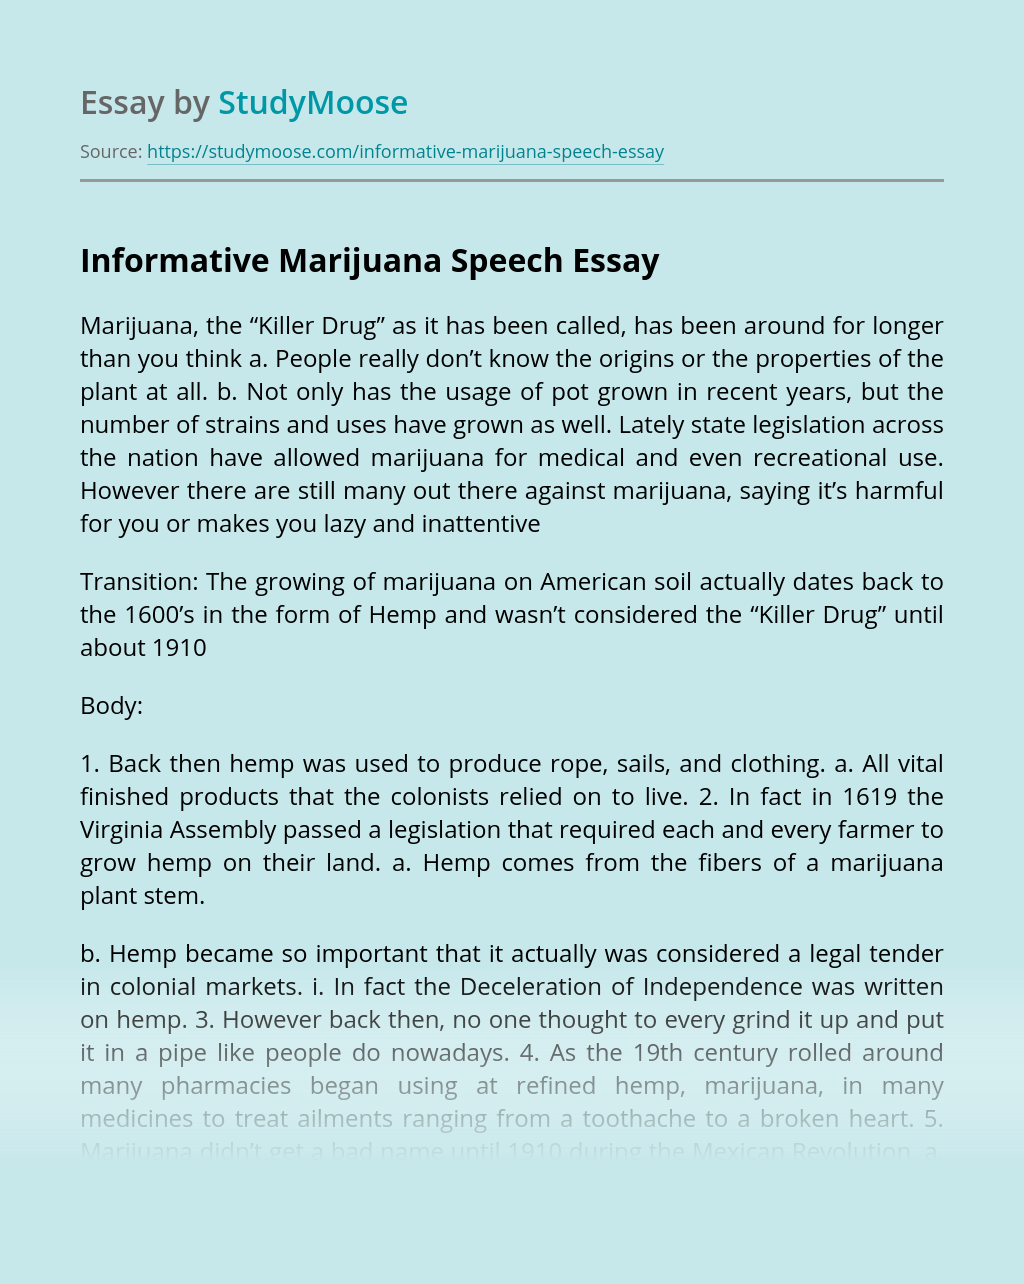 Informative Marijuana Speech